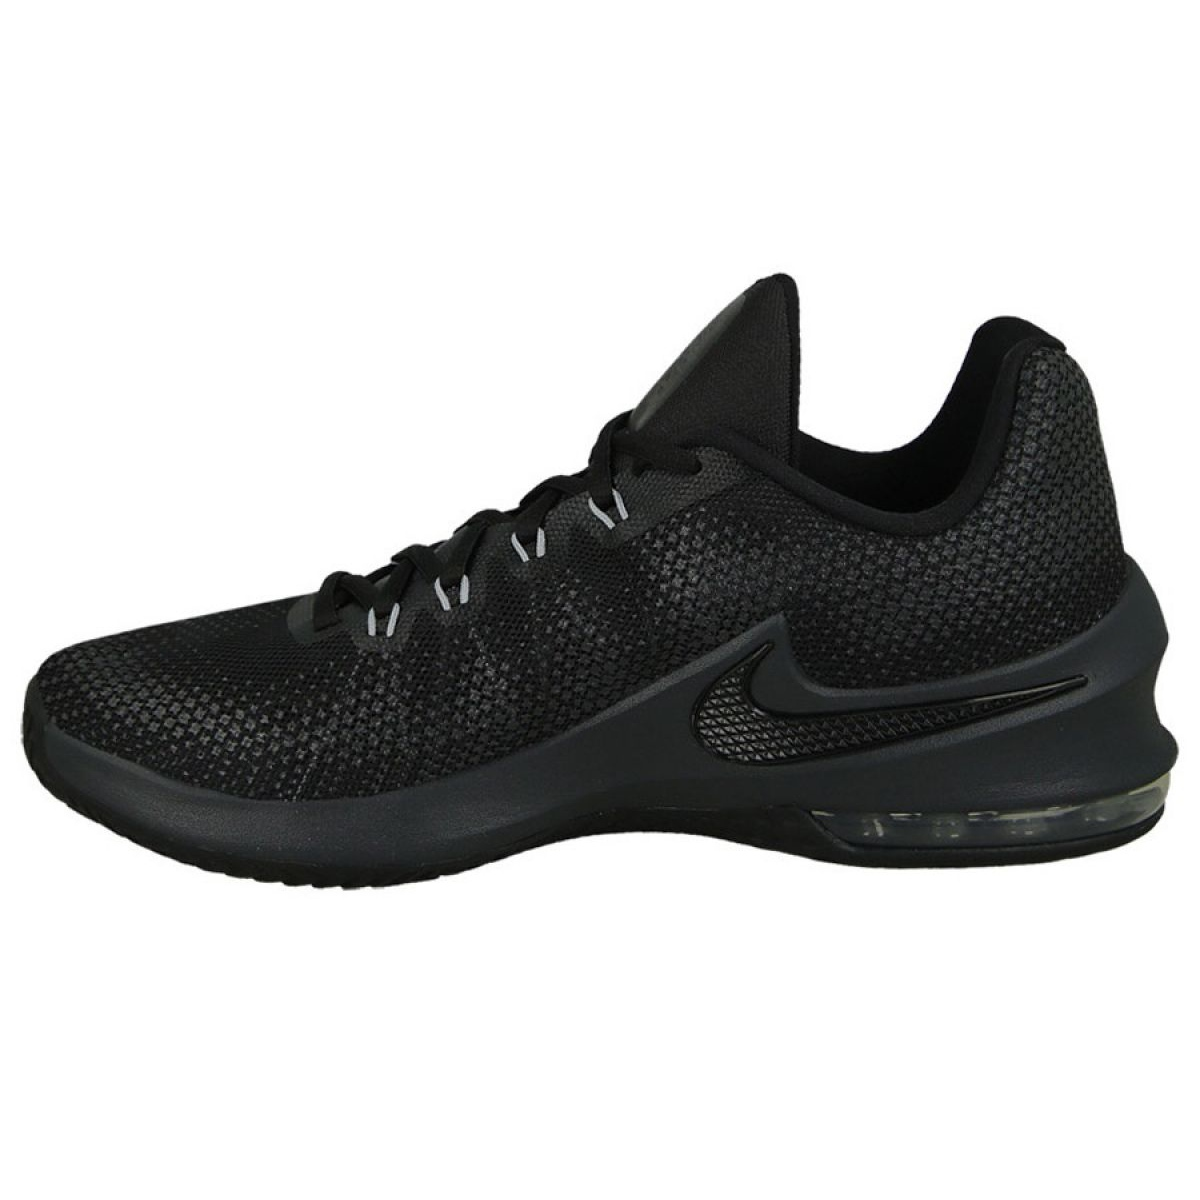 Kosárlabda cipő Nike Air Max Infuriate Low M 852457 001 fekete fekete